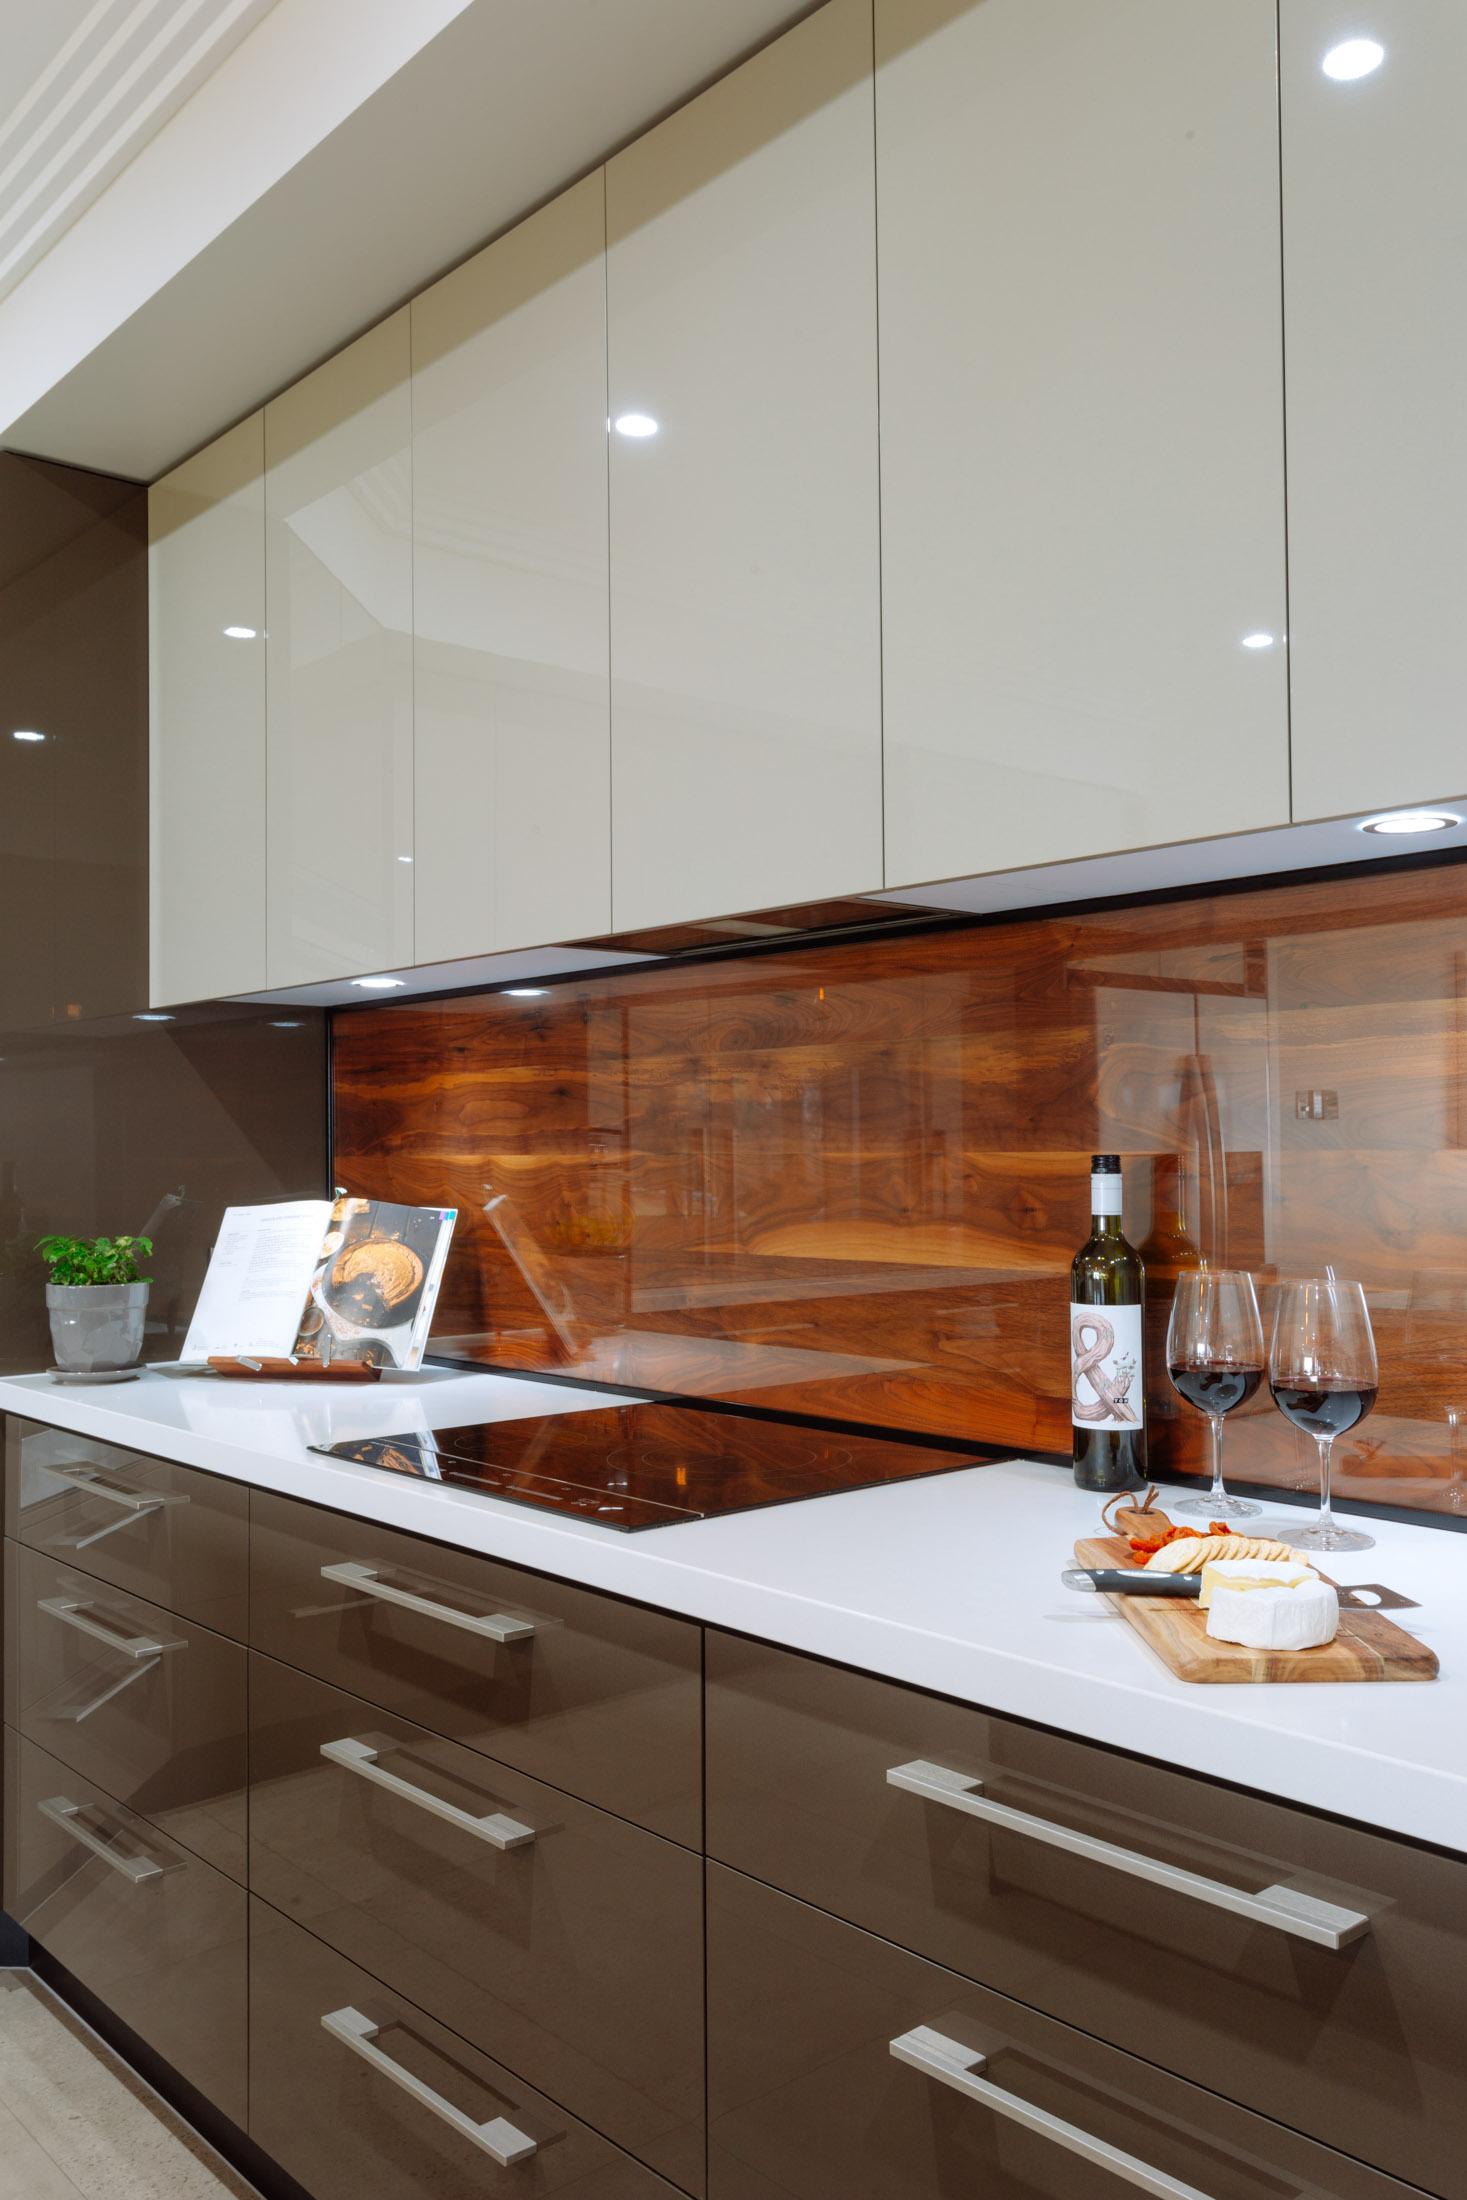 Miller Kitchens -_MG_8659.jpg